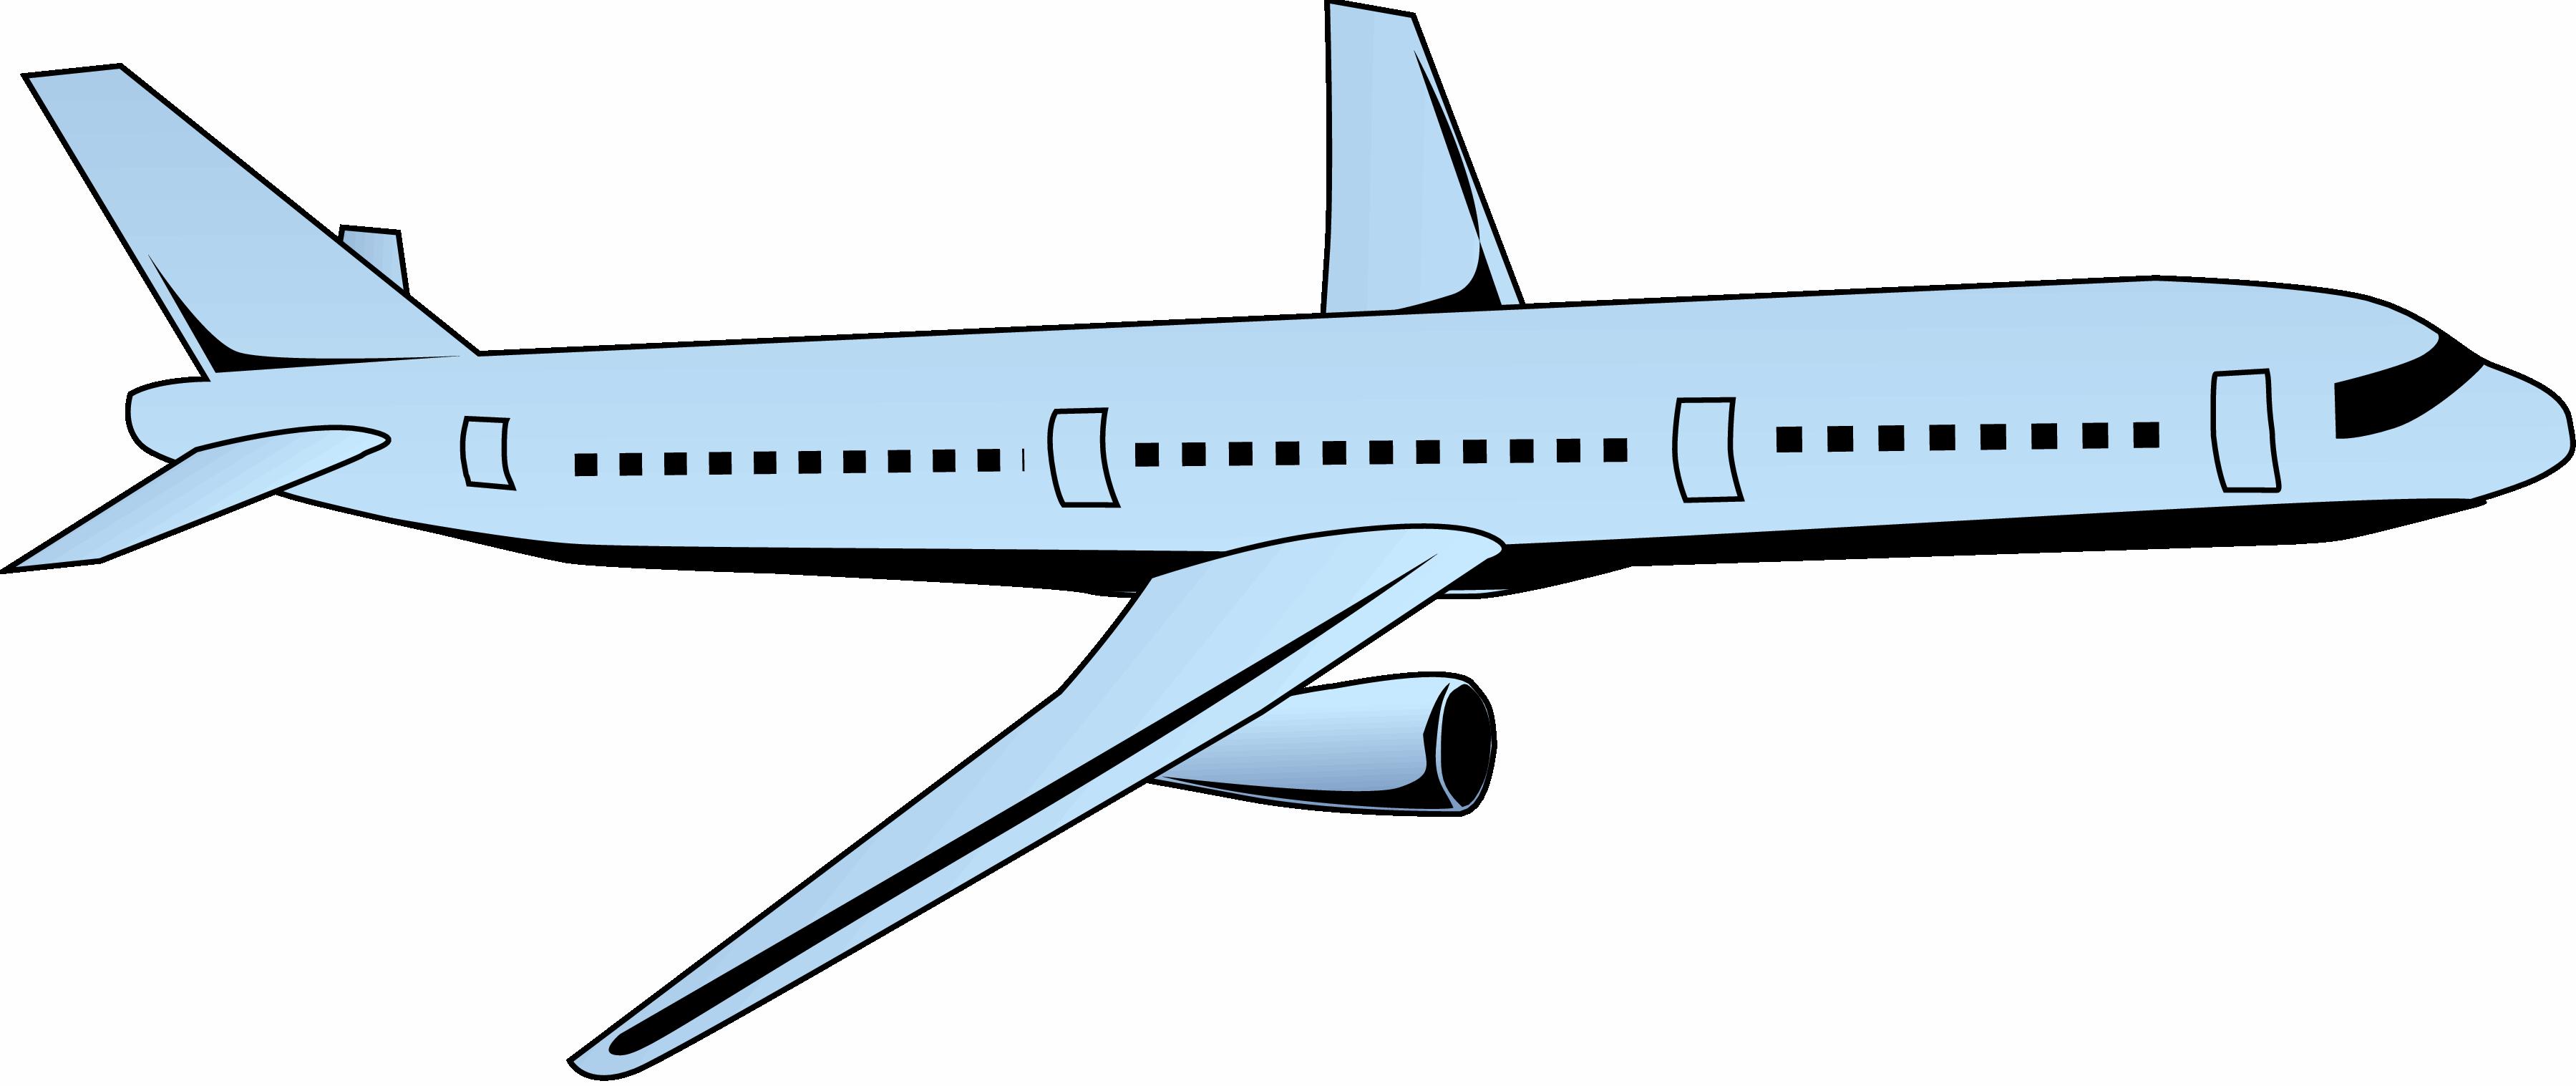 Png Airplane Cartoon Source Link Airplane Cartoon Png Cartoon Airplane Airplane Drawing Cartoon Plane